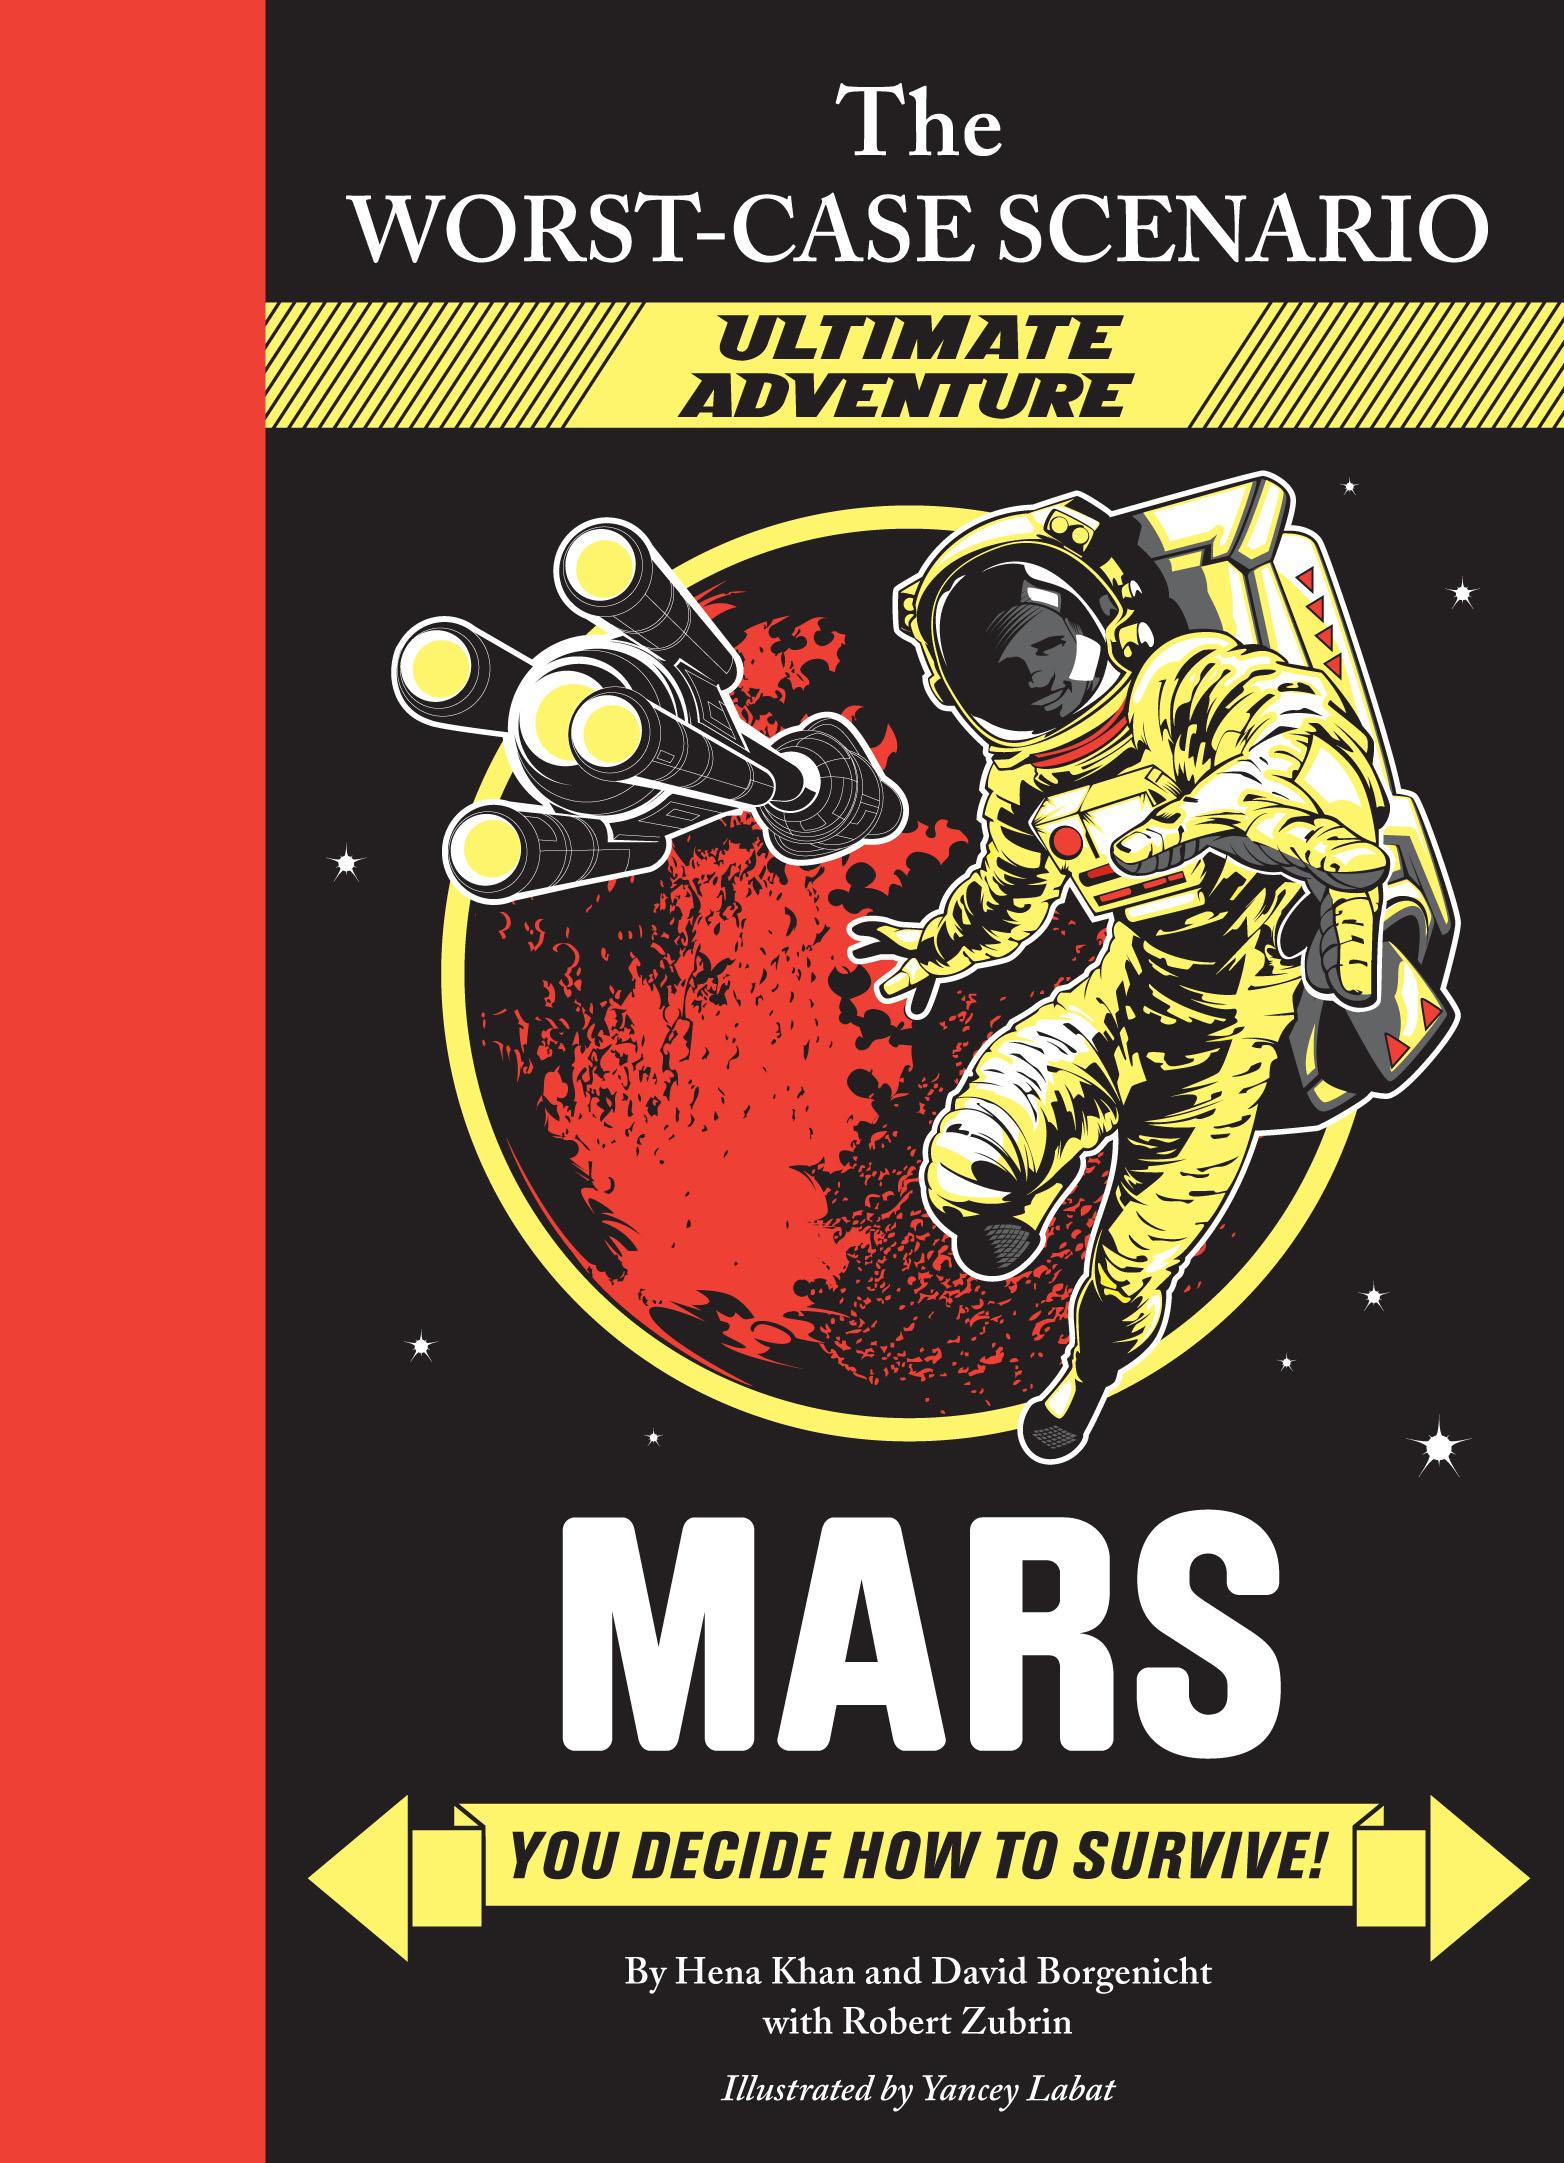 WCS Mars-1.jpg